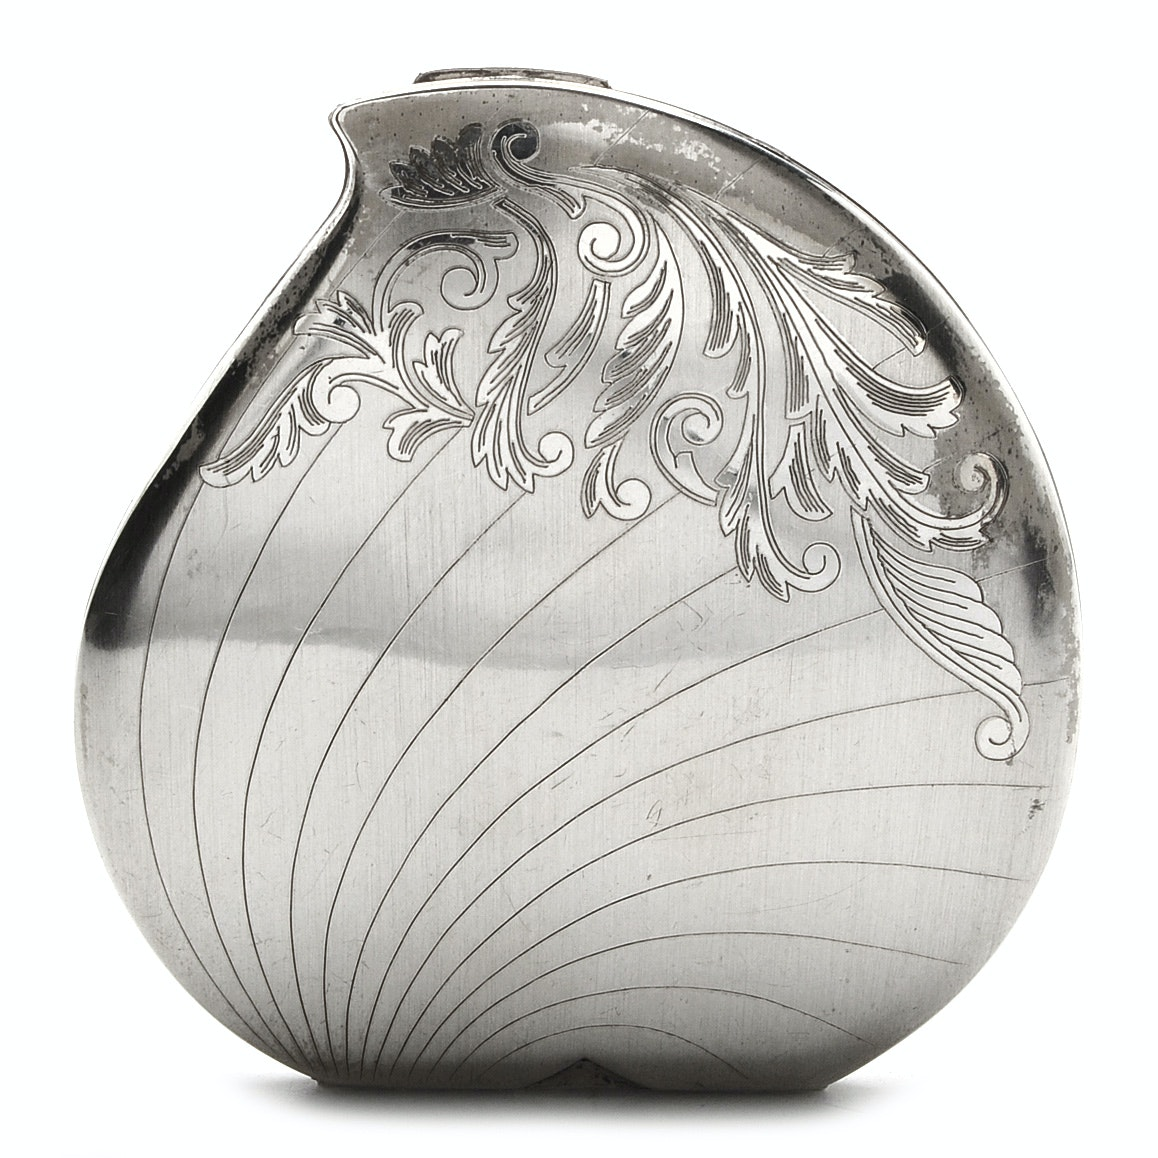 Elgin American Sterling Silver Compact Mirror